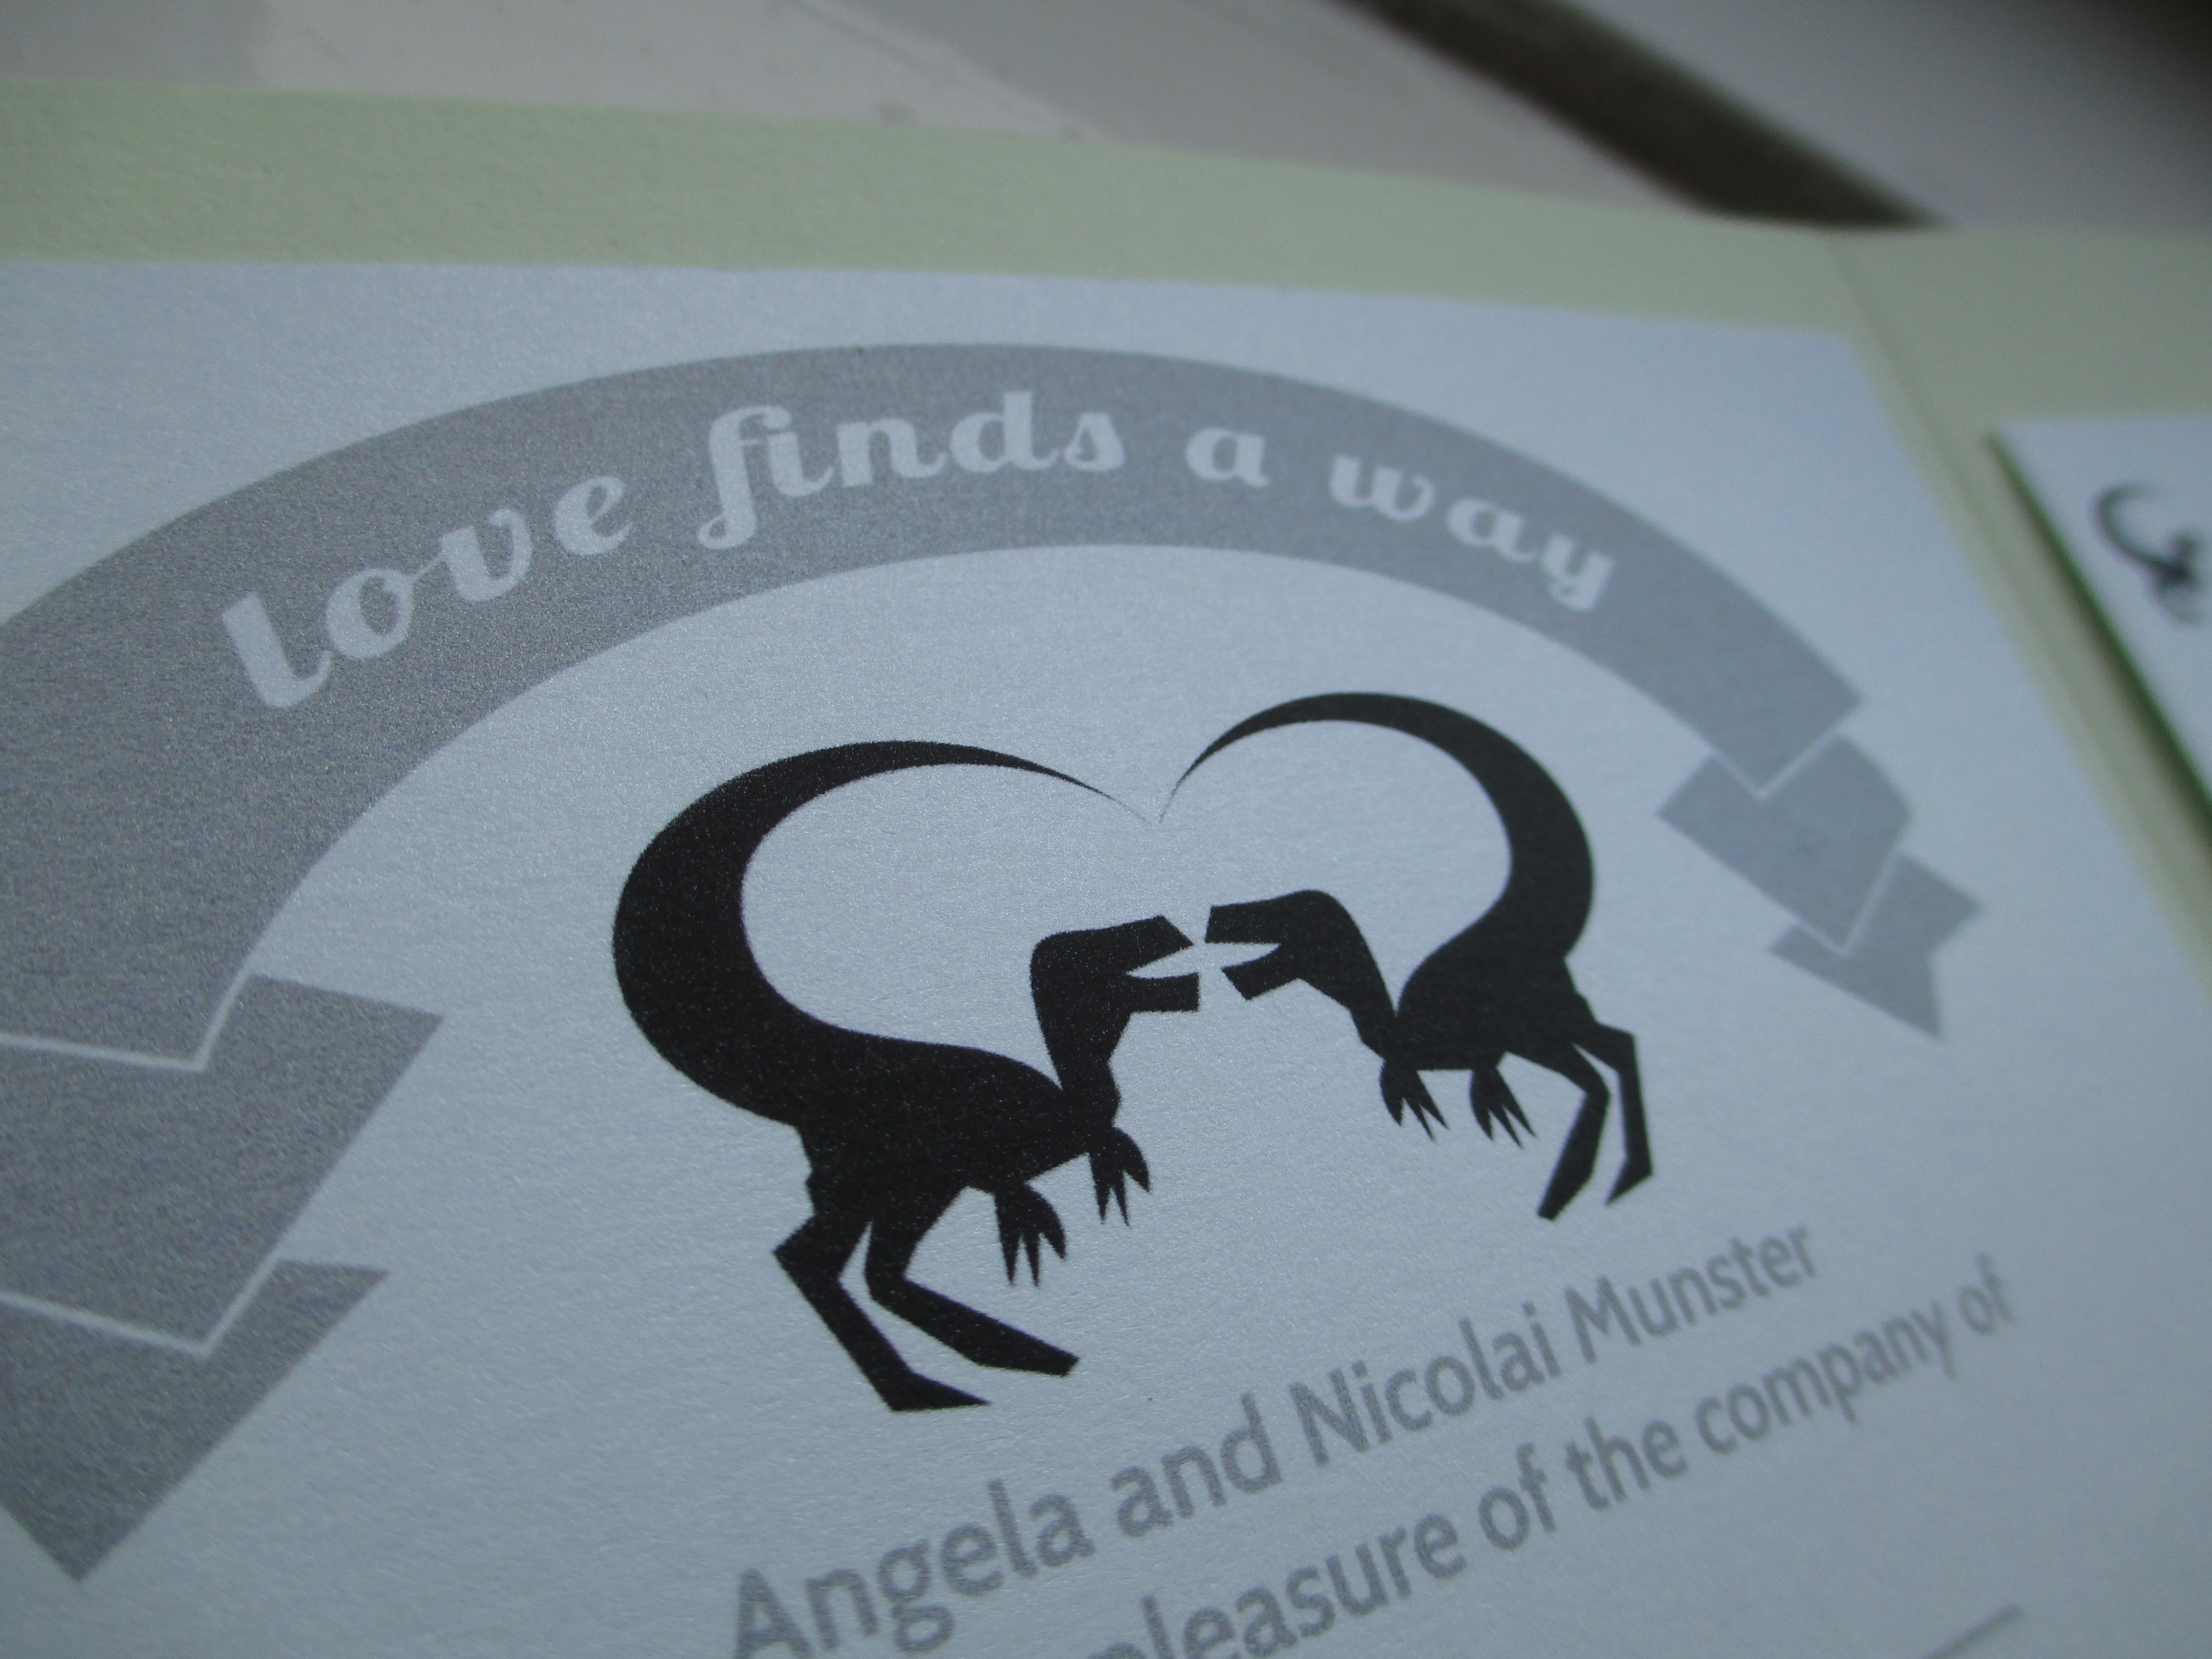 Dinosaur Wedding Invitations: Jurassic Heart: Why We Chose Dinosaurs As Our Wedding Theme